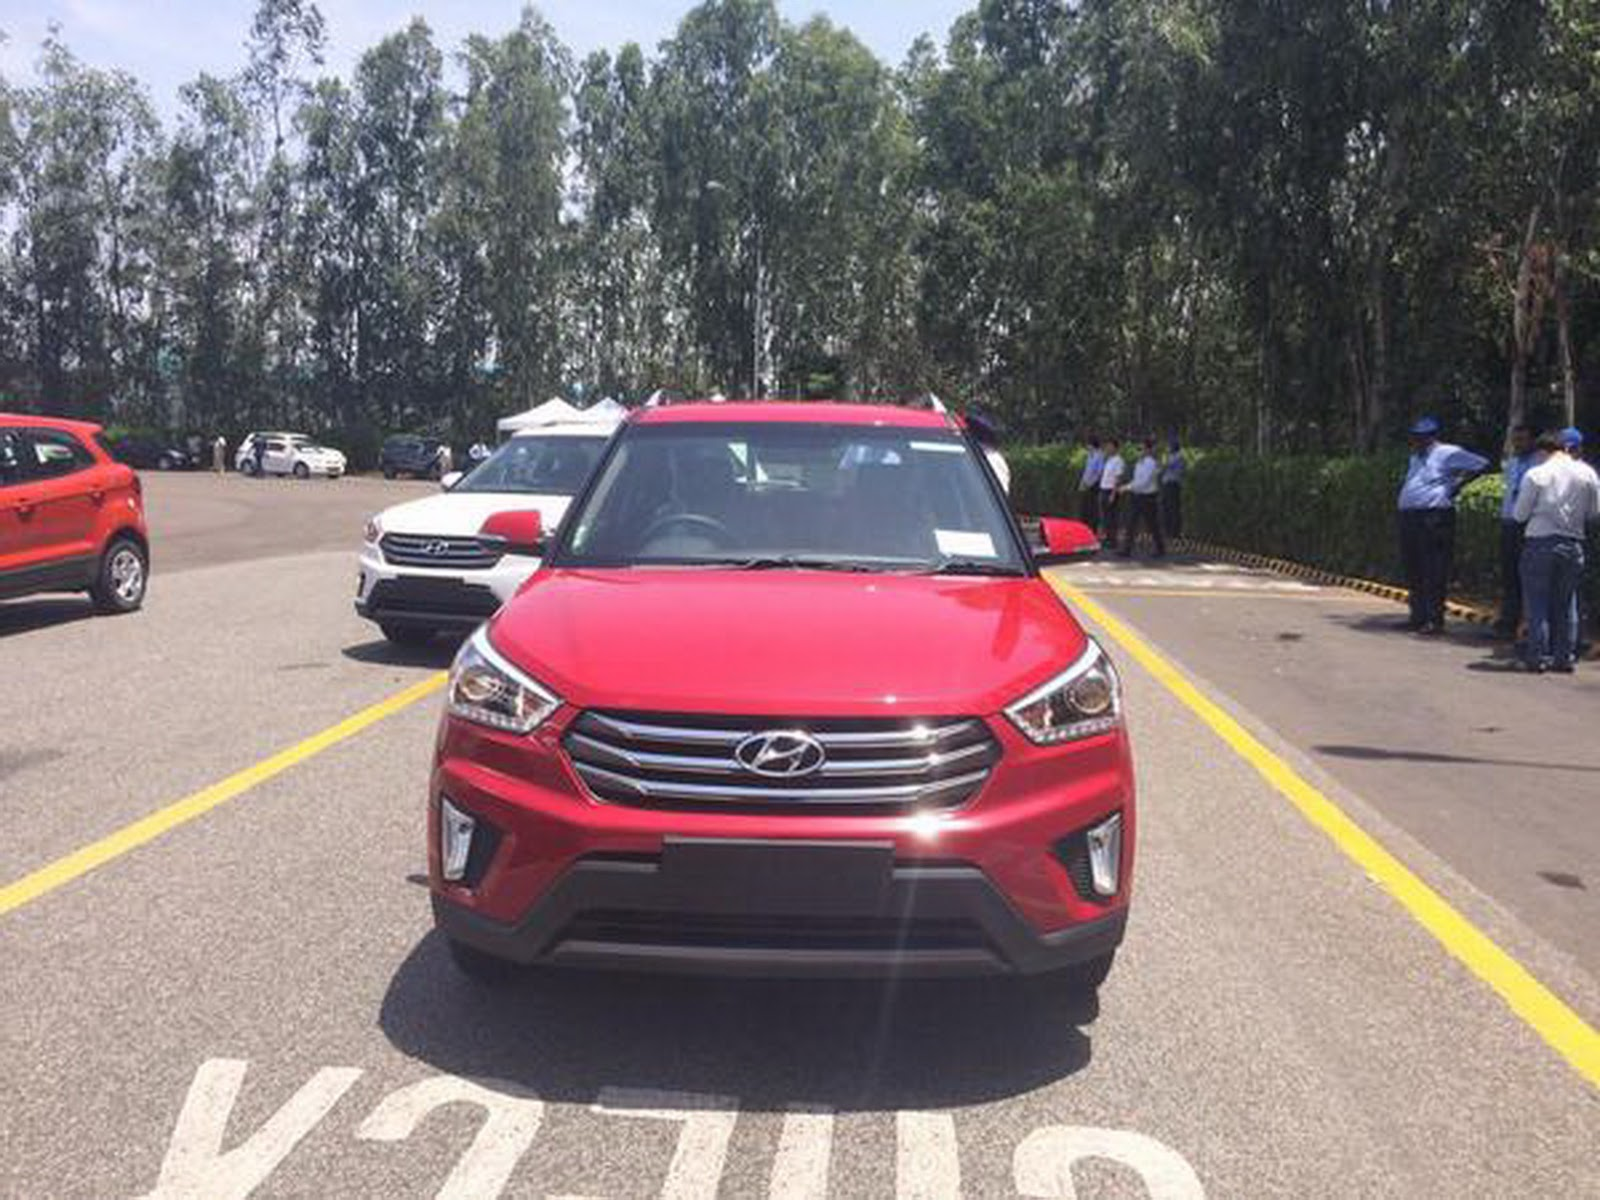 unveiled september india in hyundai iii crdi duesseldorf premium auto tucson gen frontansicht manufacturer autogyaan expo